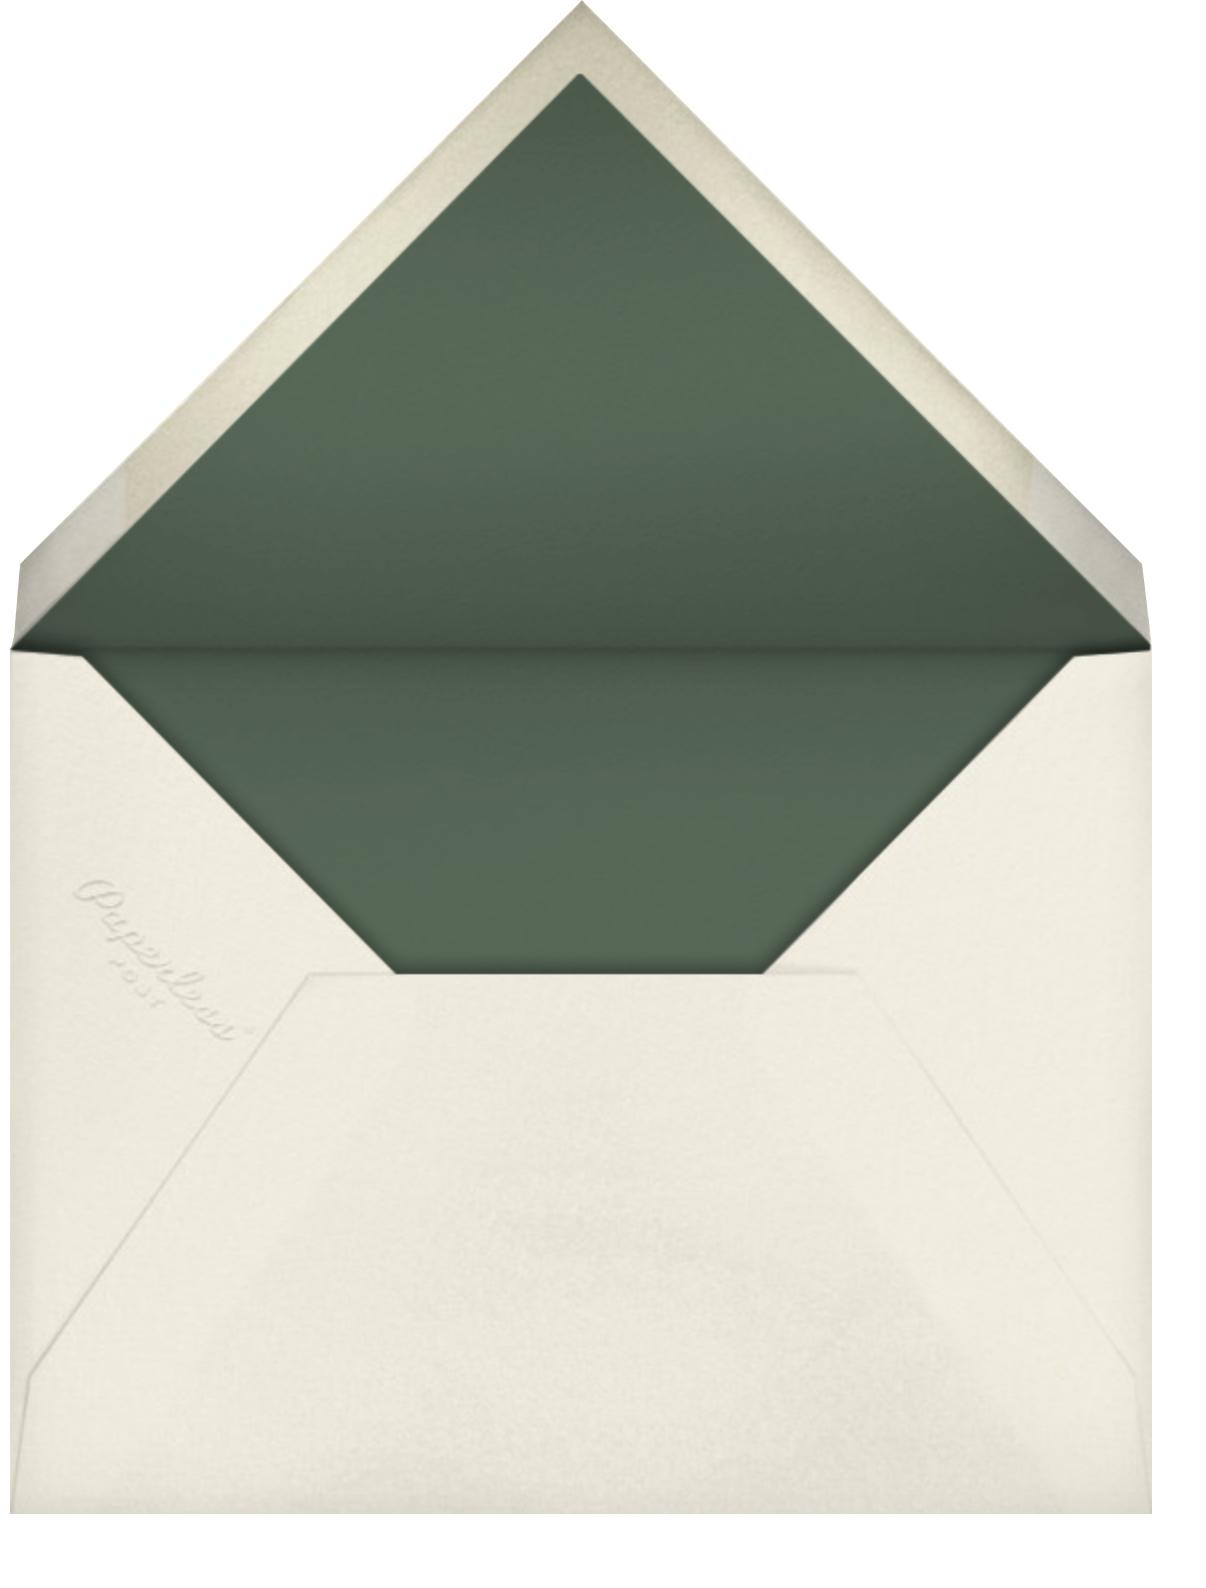 Cadenza - Palm - Venamour - Dinner party - envelope back